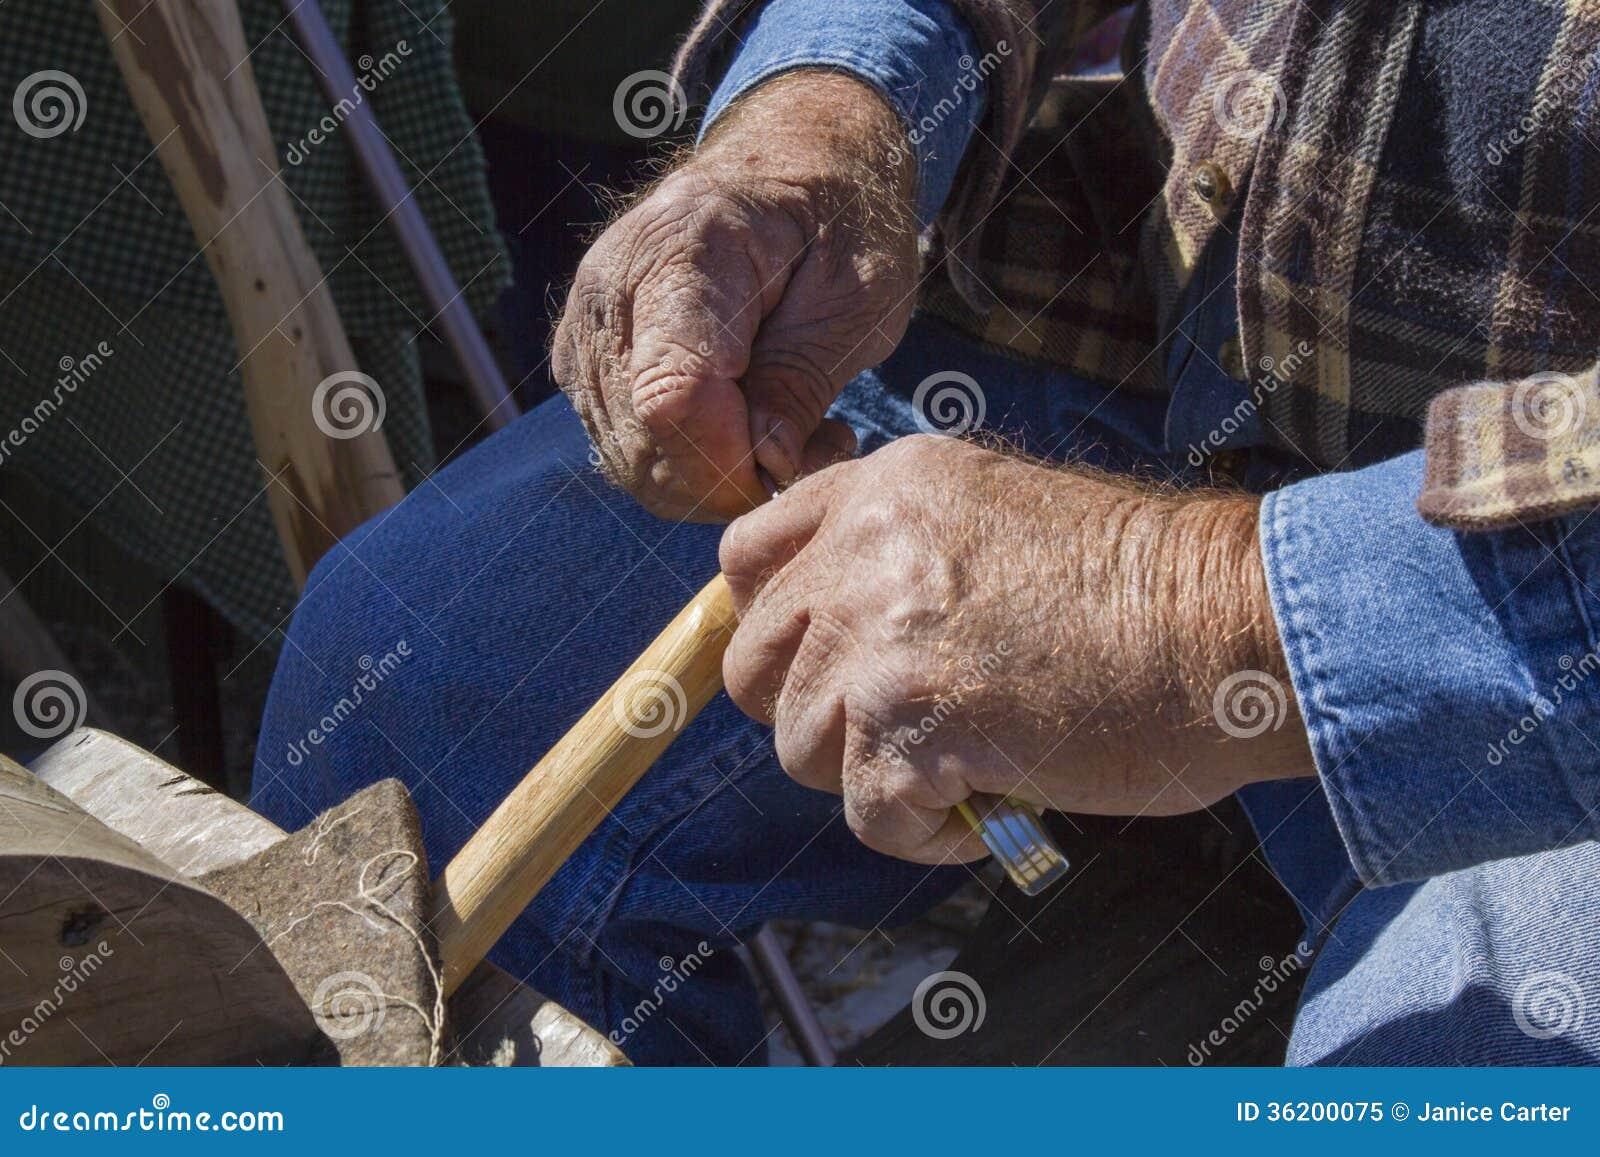 Cane Maker